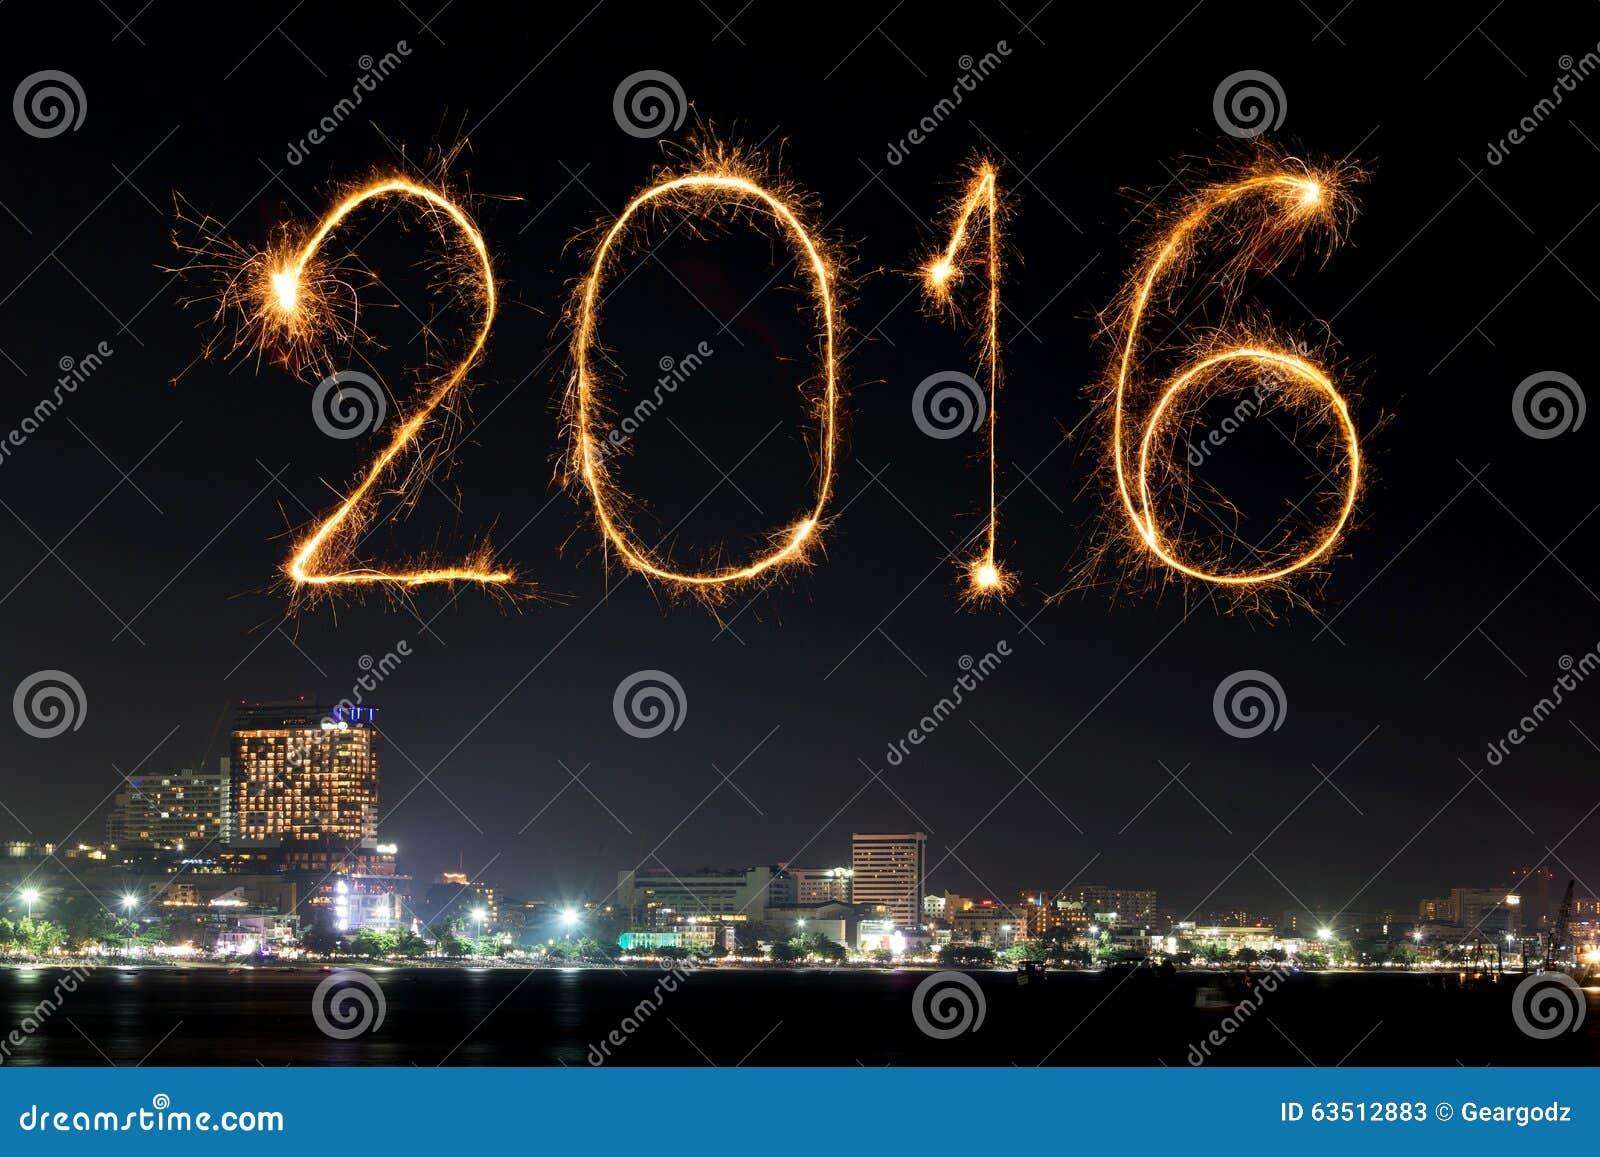 2016 happy new year fireworks celebrating over pattaya beach